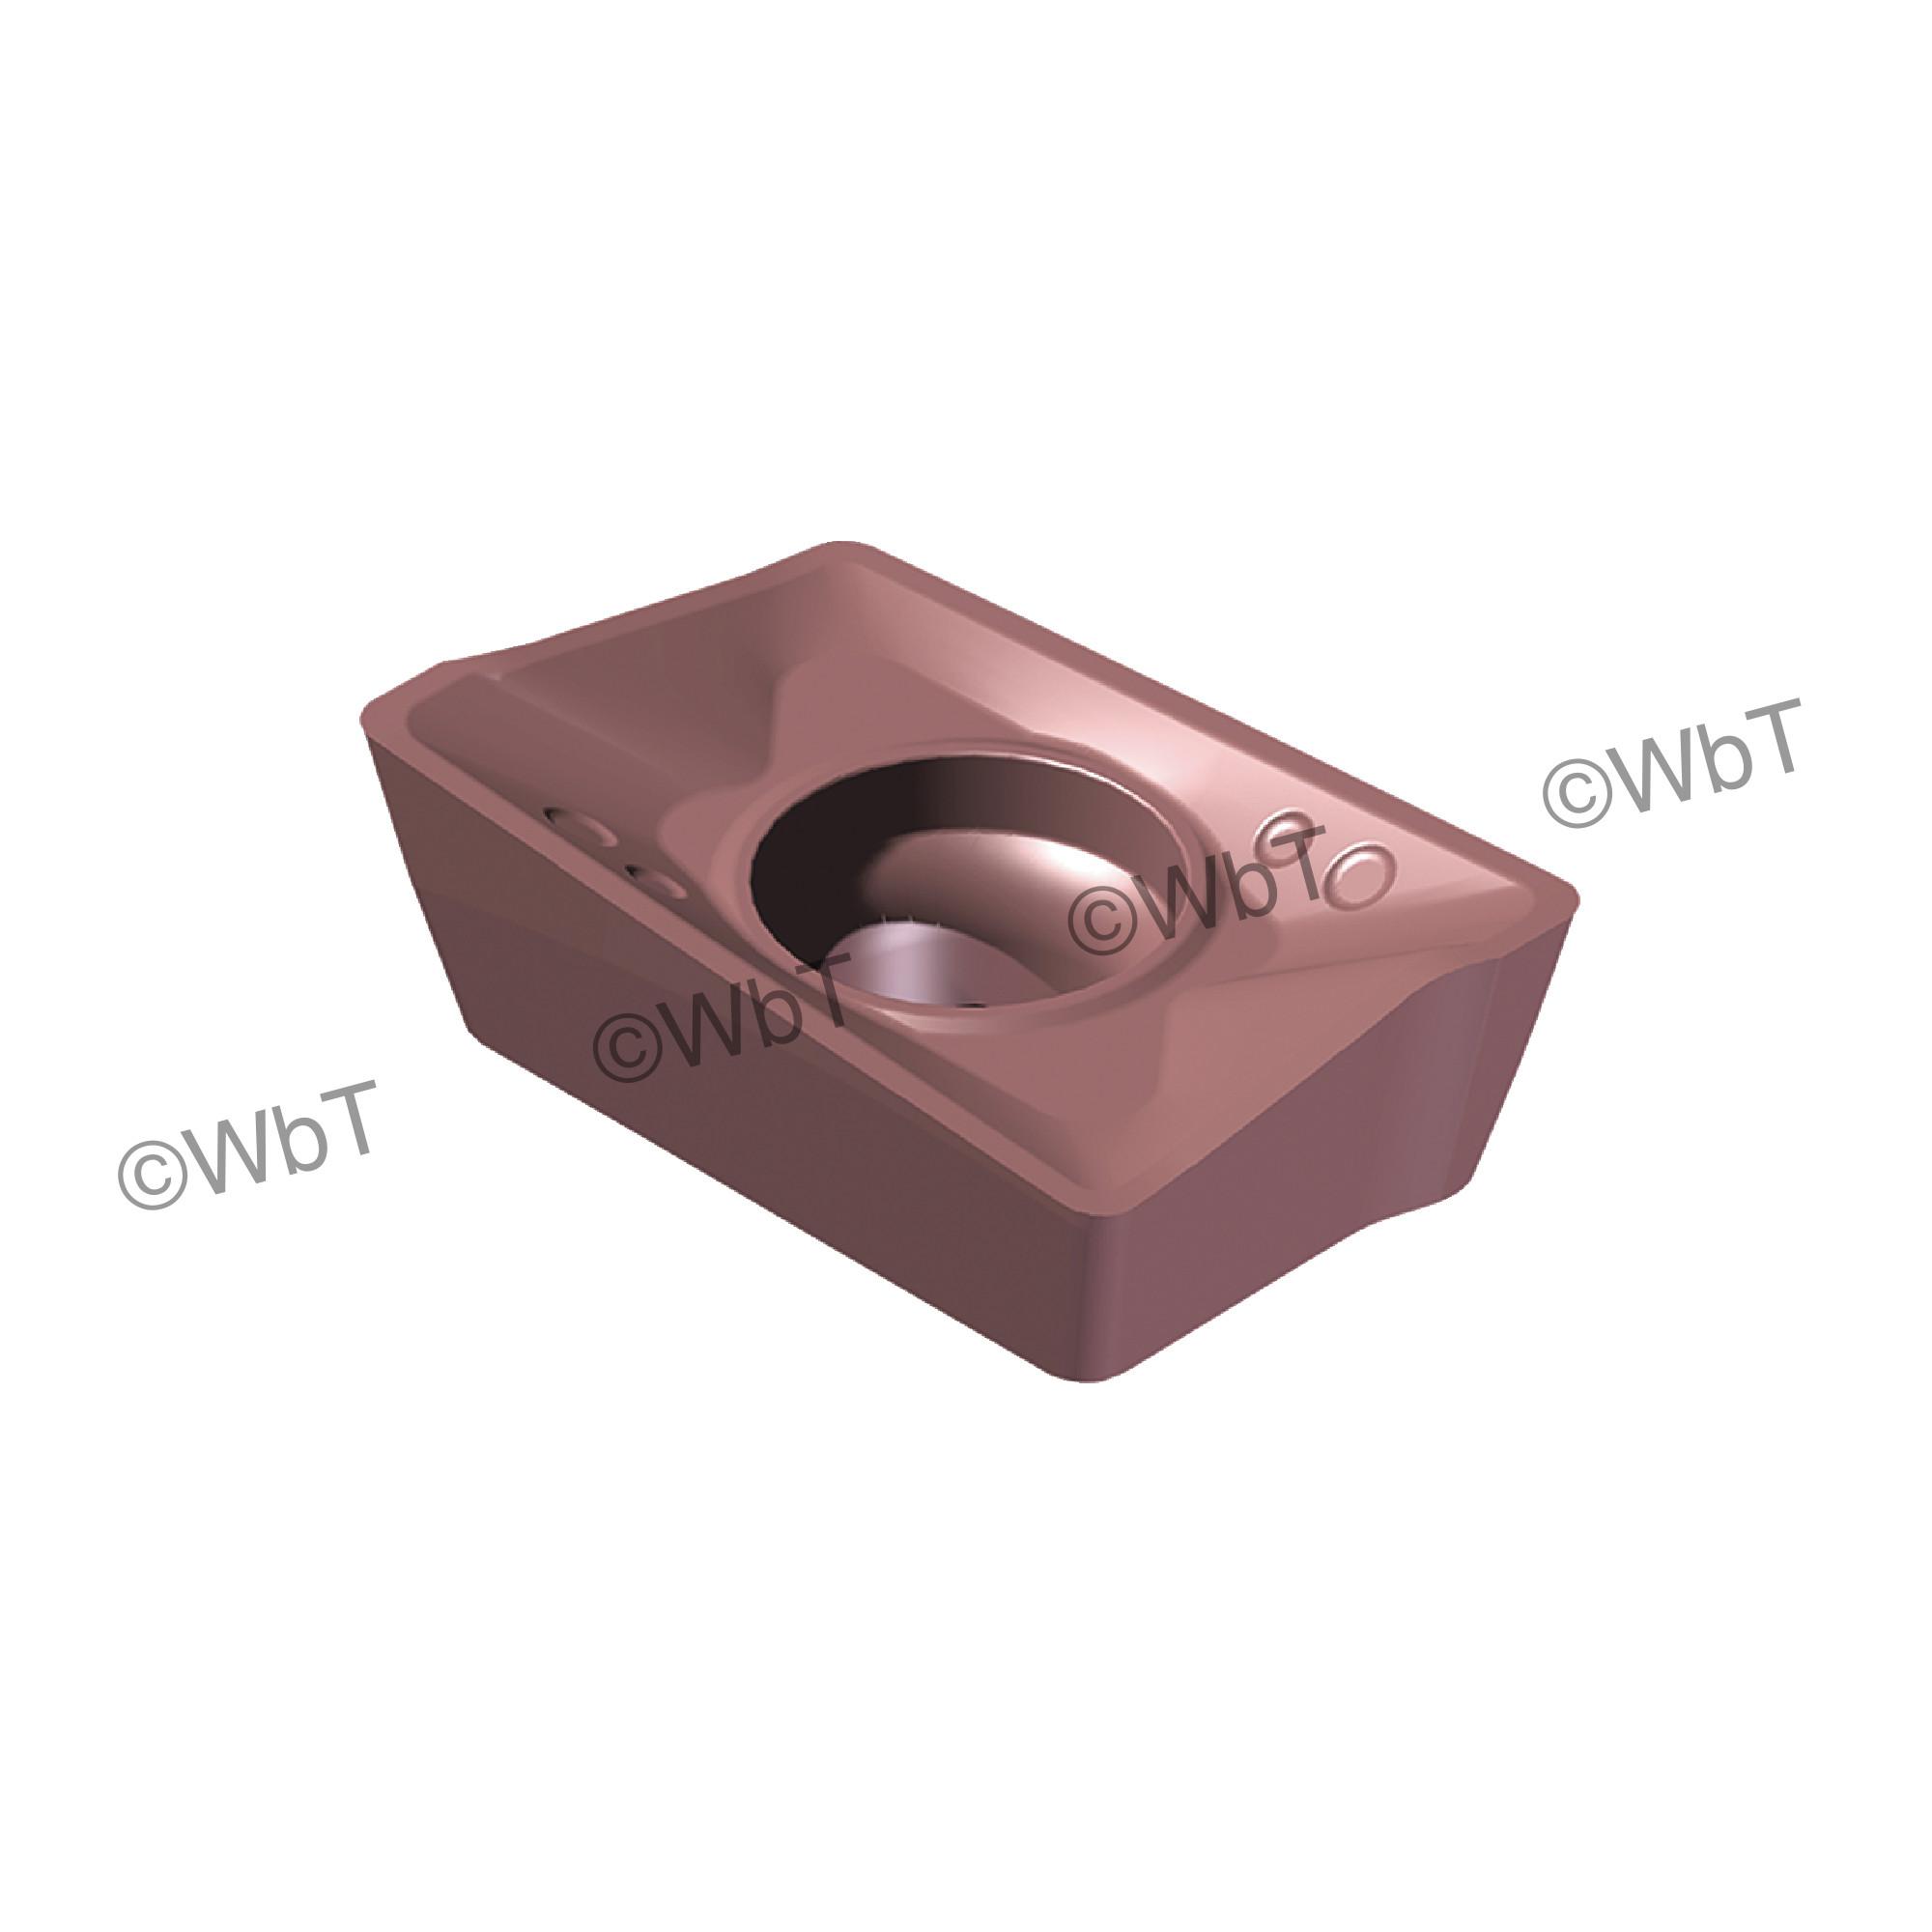 AKUMA - APKT1003PDR-R1 PM15M Parallelogram / Indexable Carbide Milling Insert